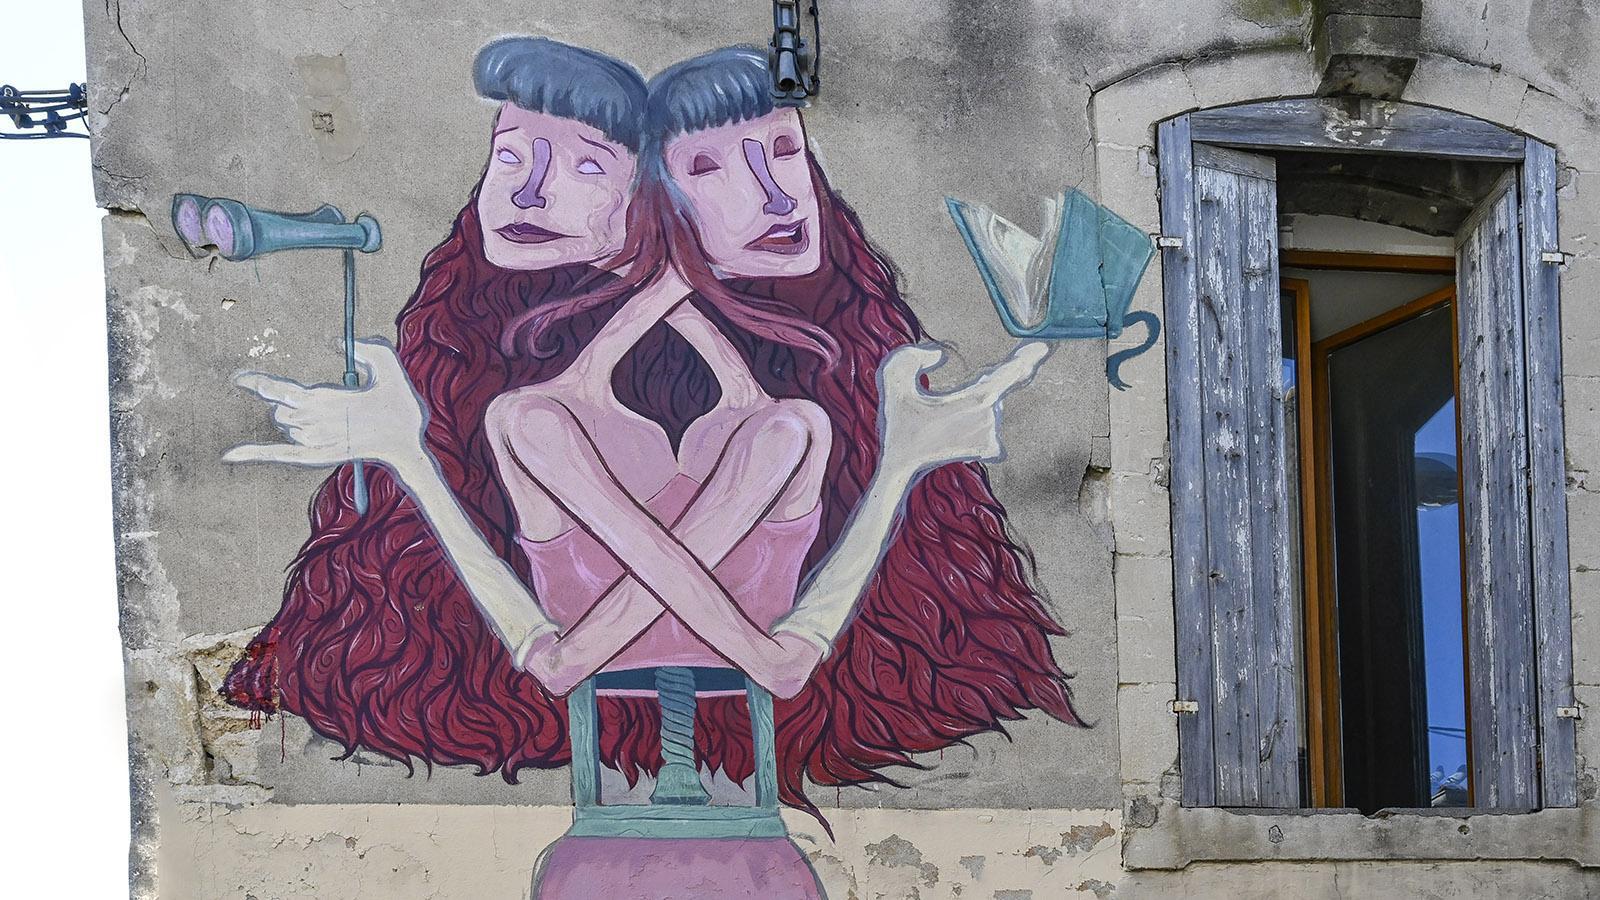 Street Art Nîmes, Richelieu: Primal Graphic. Foto: Hilke Maunder